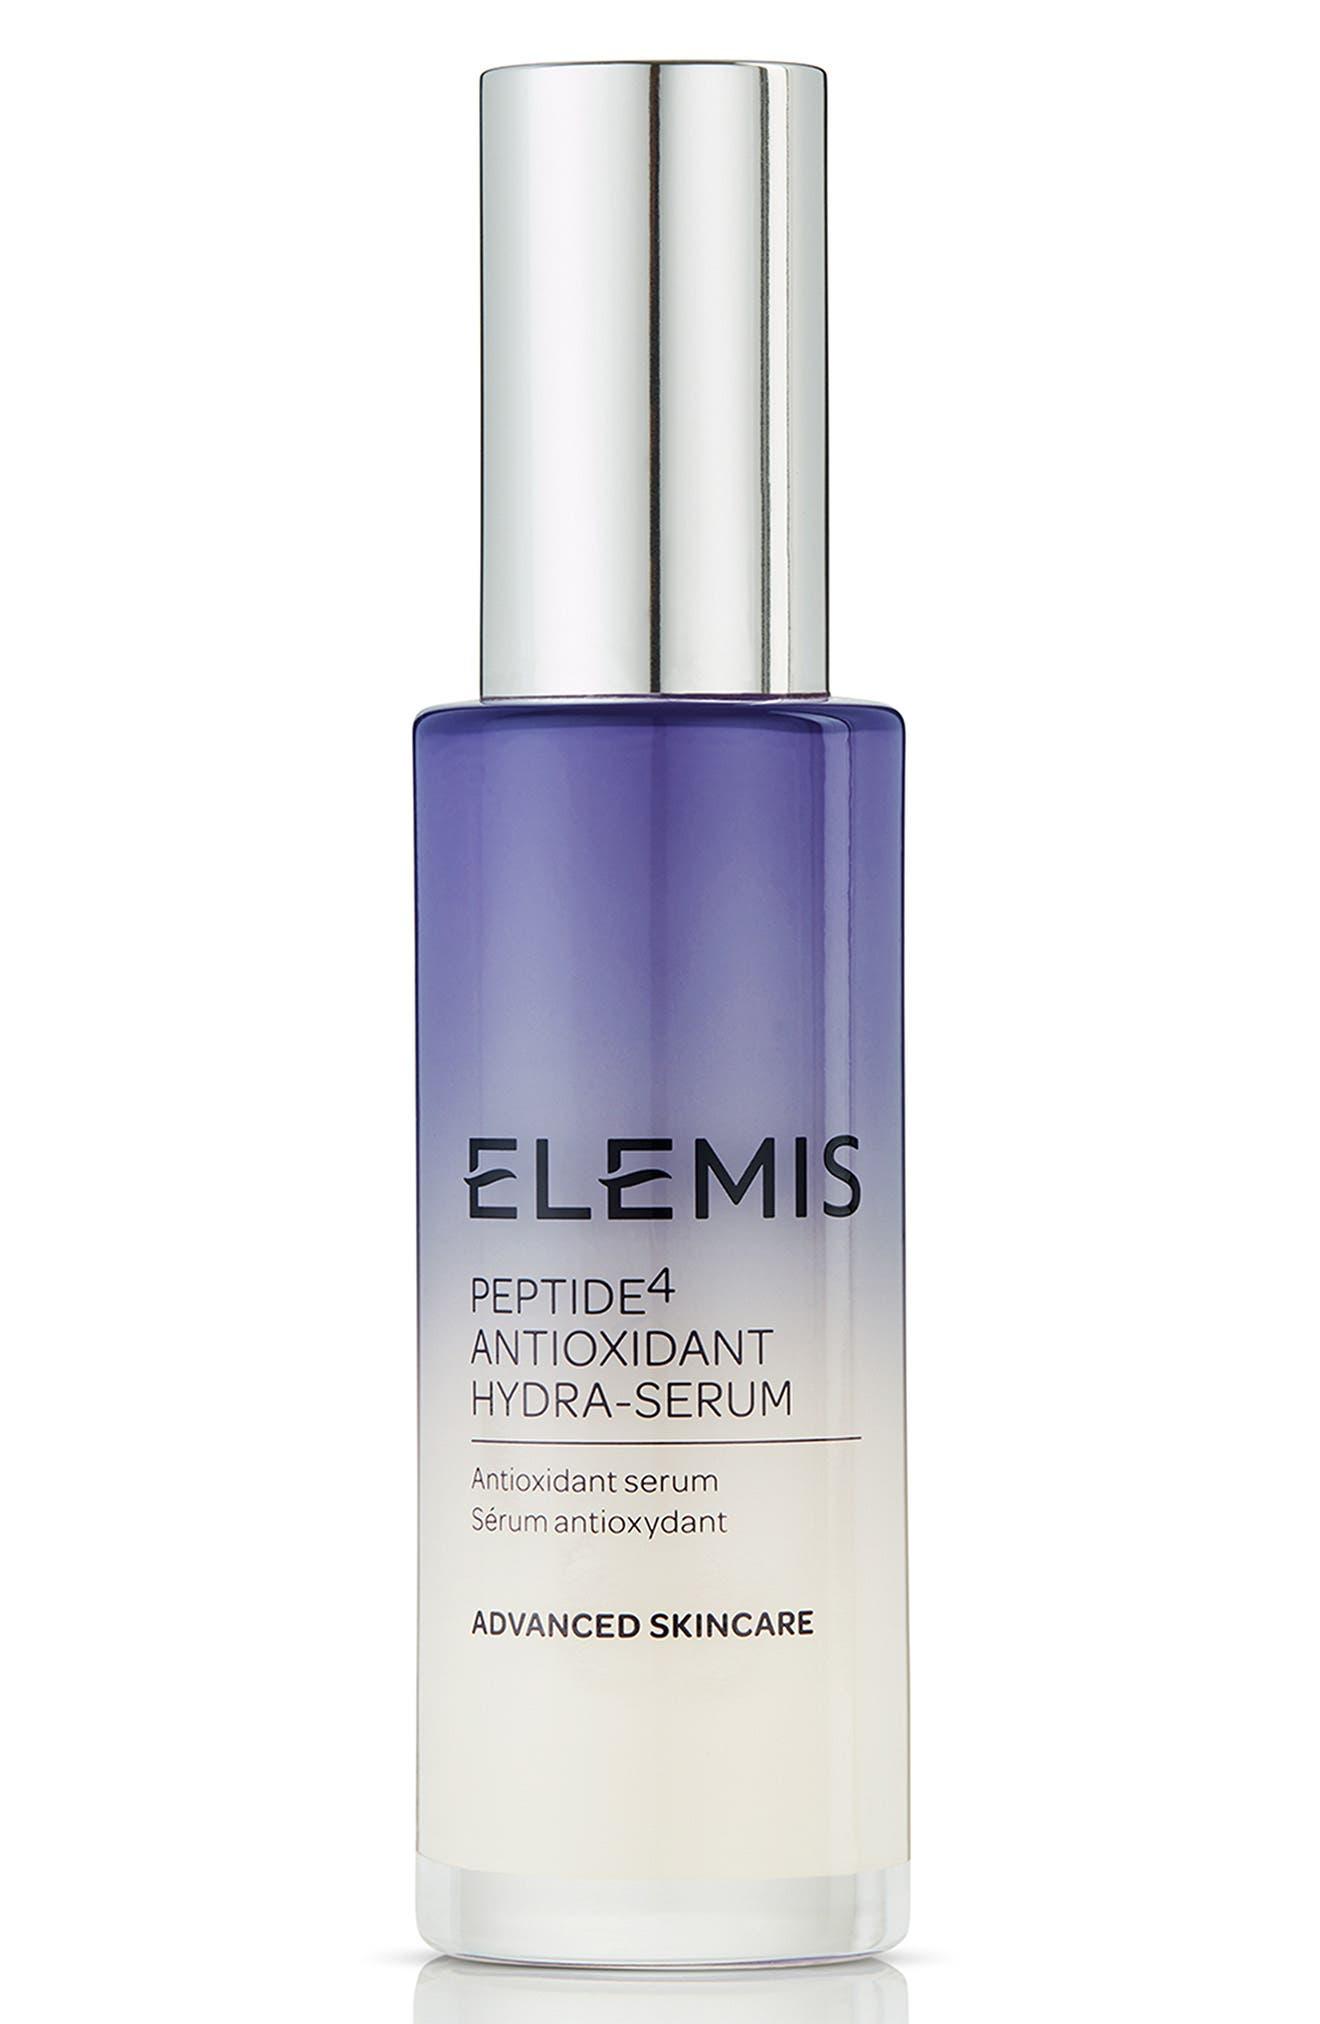 Image of Elemis Peptide4 Antioxidant Hydra-Serum